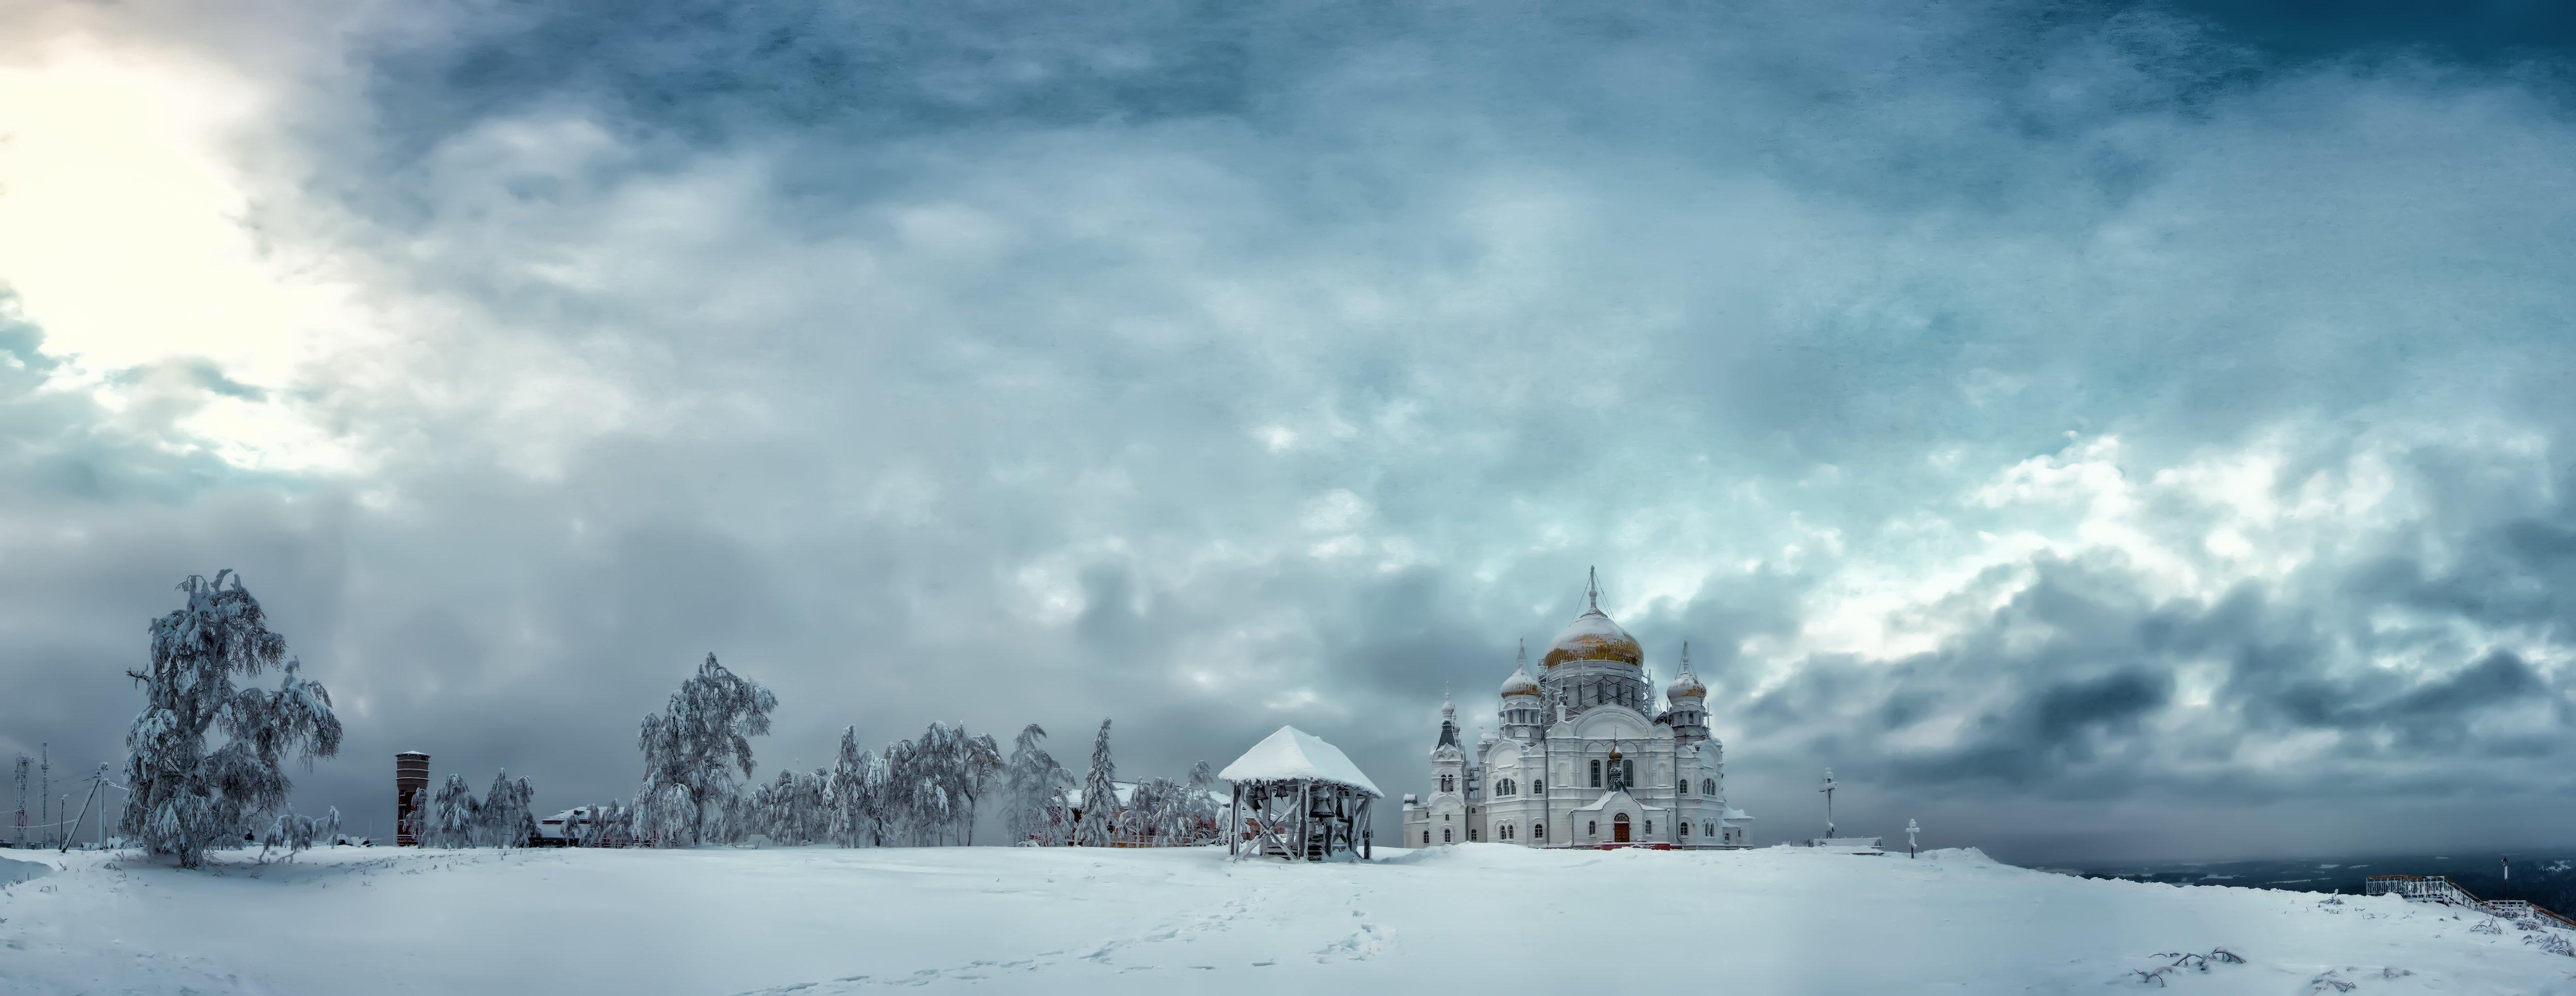 Белогорье, Пермь, Монастырь, Кемаев Александр